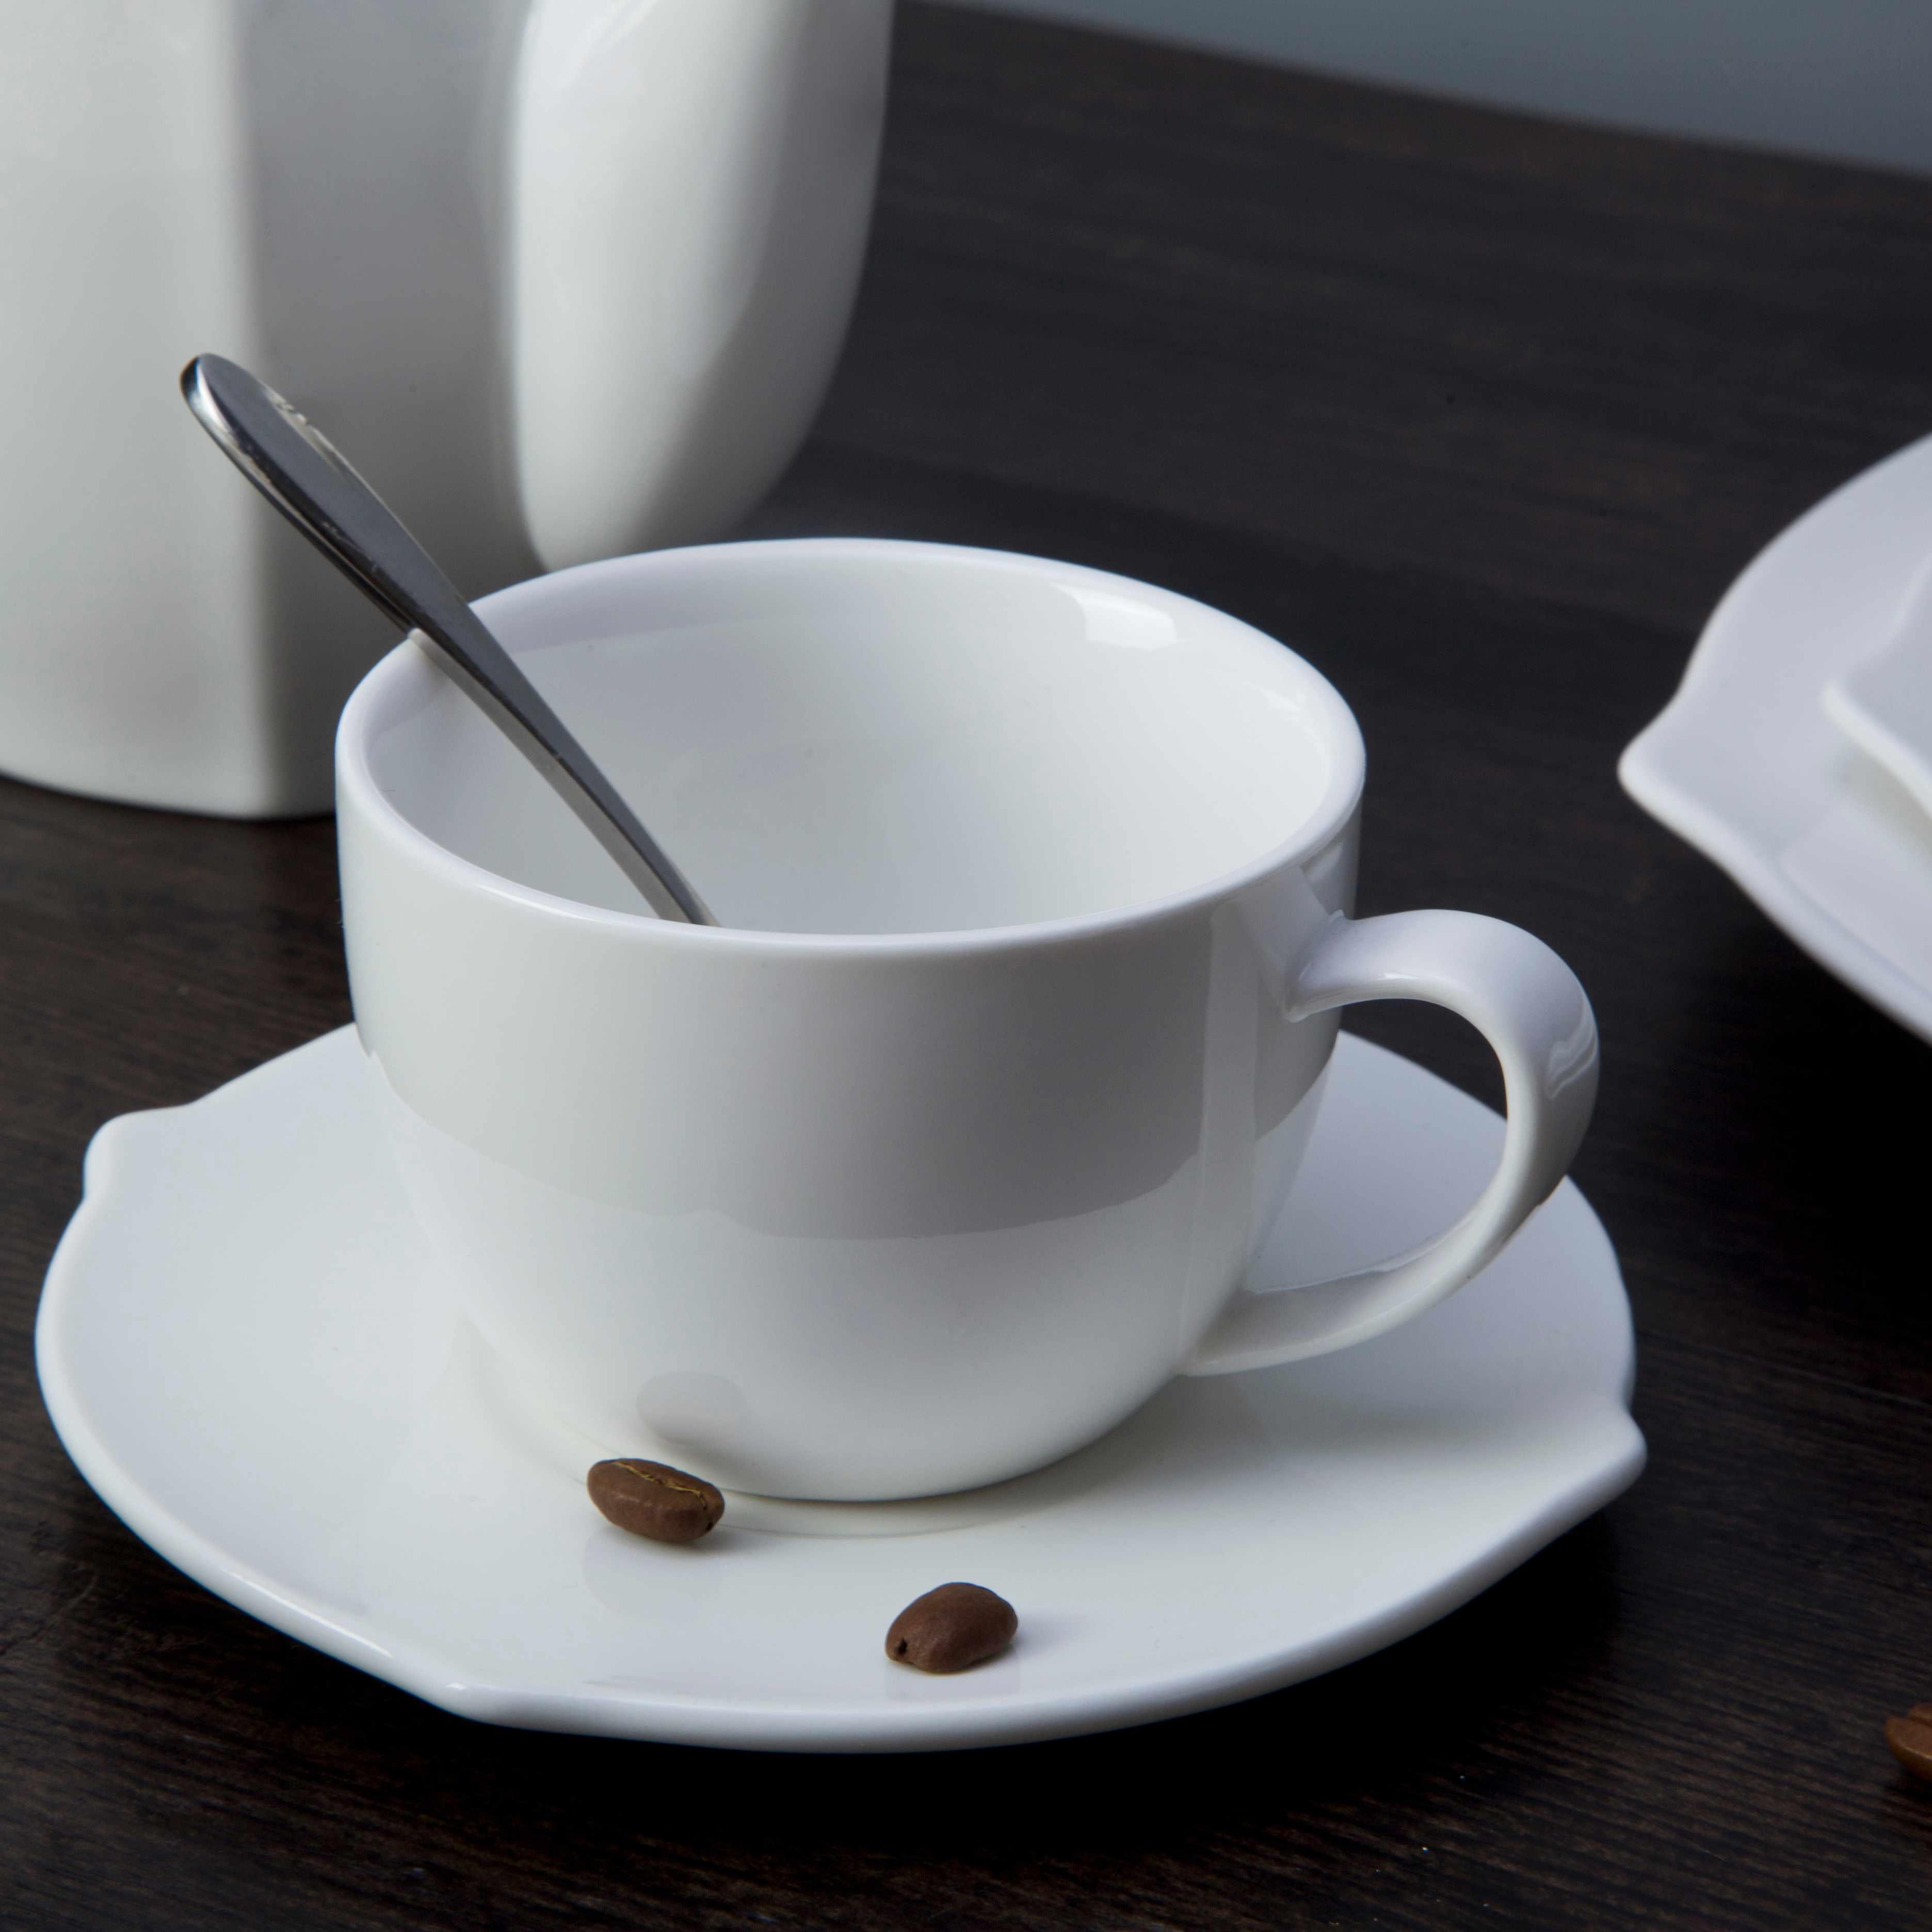 Two Eight-9 piece restaurant modern white porcelain dinnerware - TW25